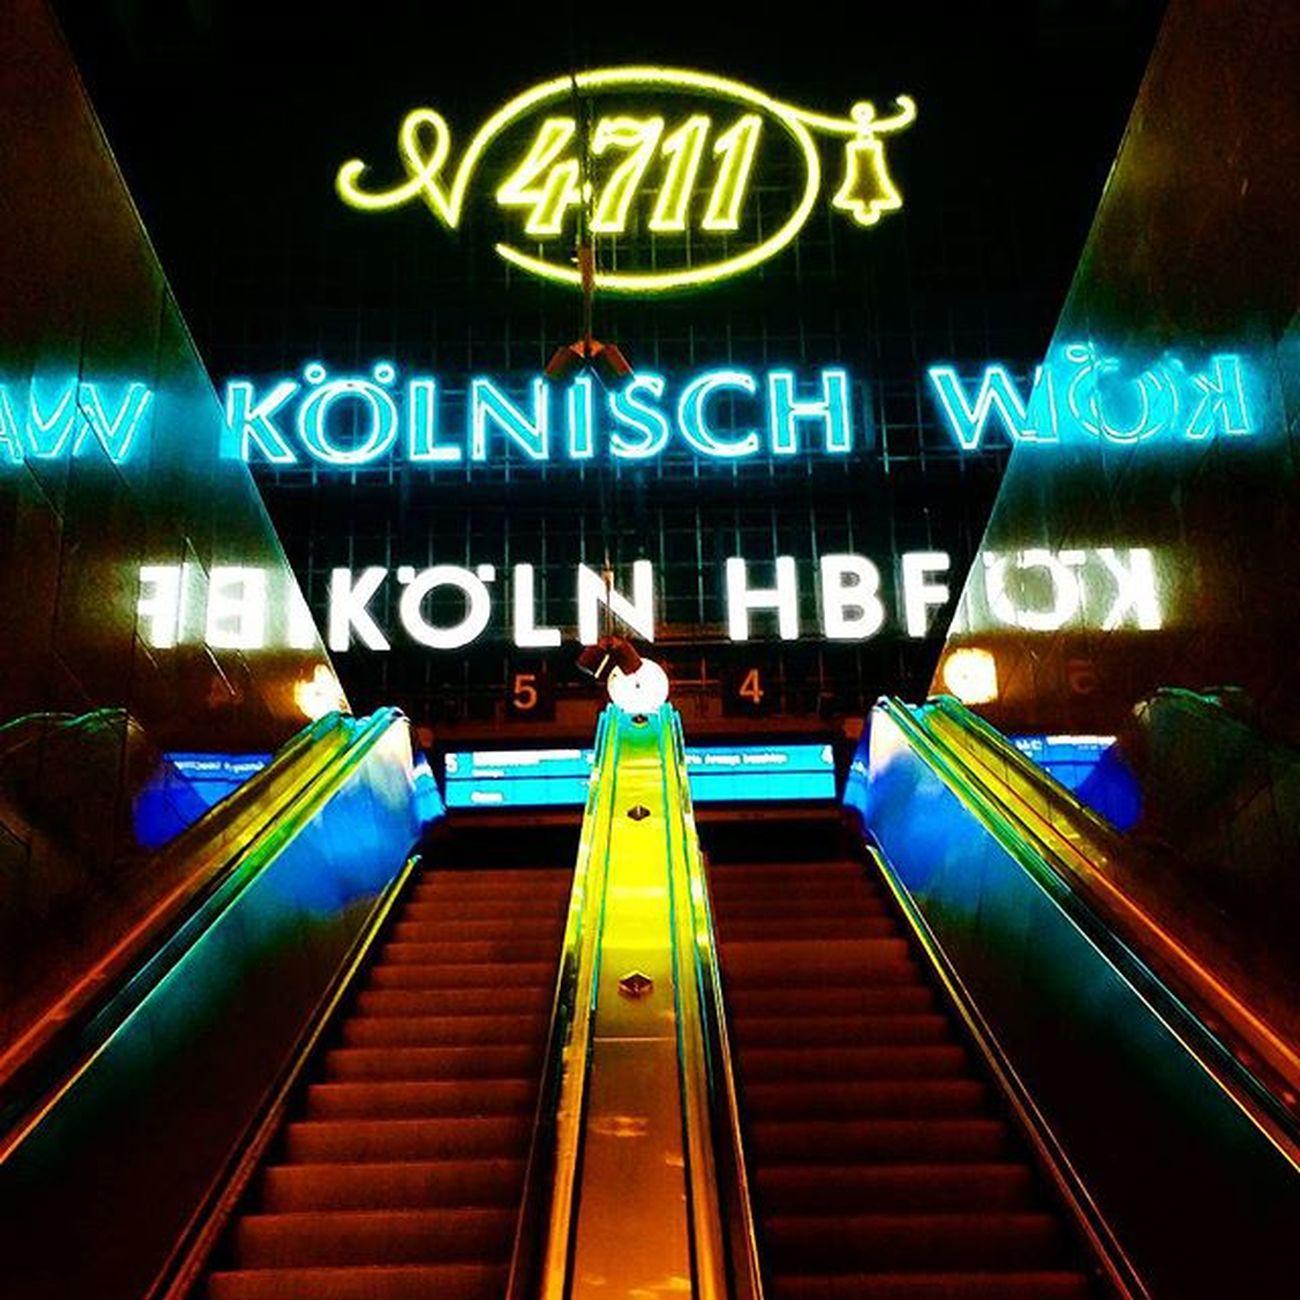 Köln Germany Dbahn Hauptbahnhof Escelator Colors Advertising Midnight LeftOrRight Upordown Decisions Dream VSCO Vscocam Instagram Instatravel